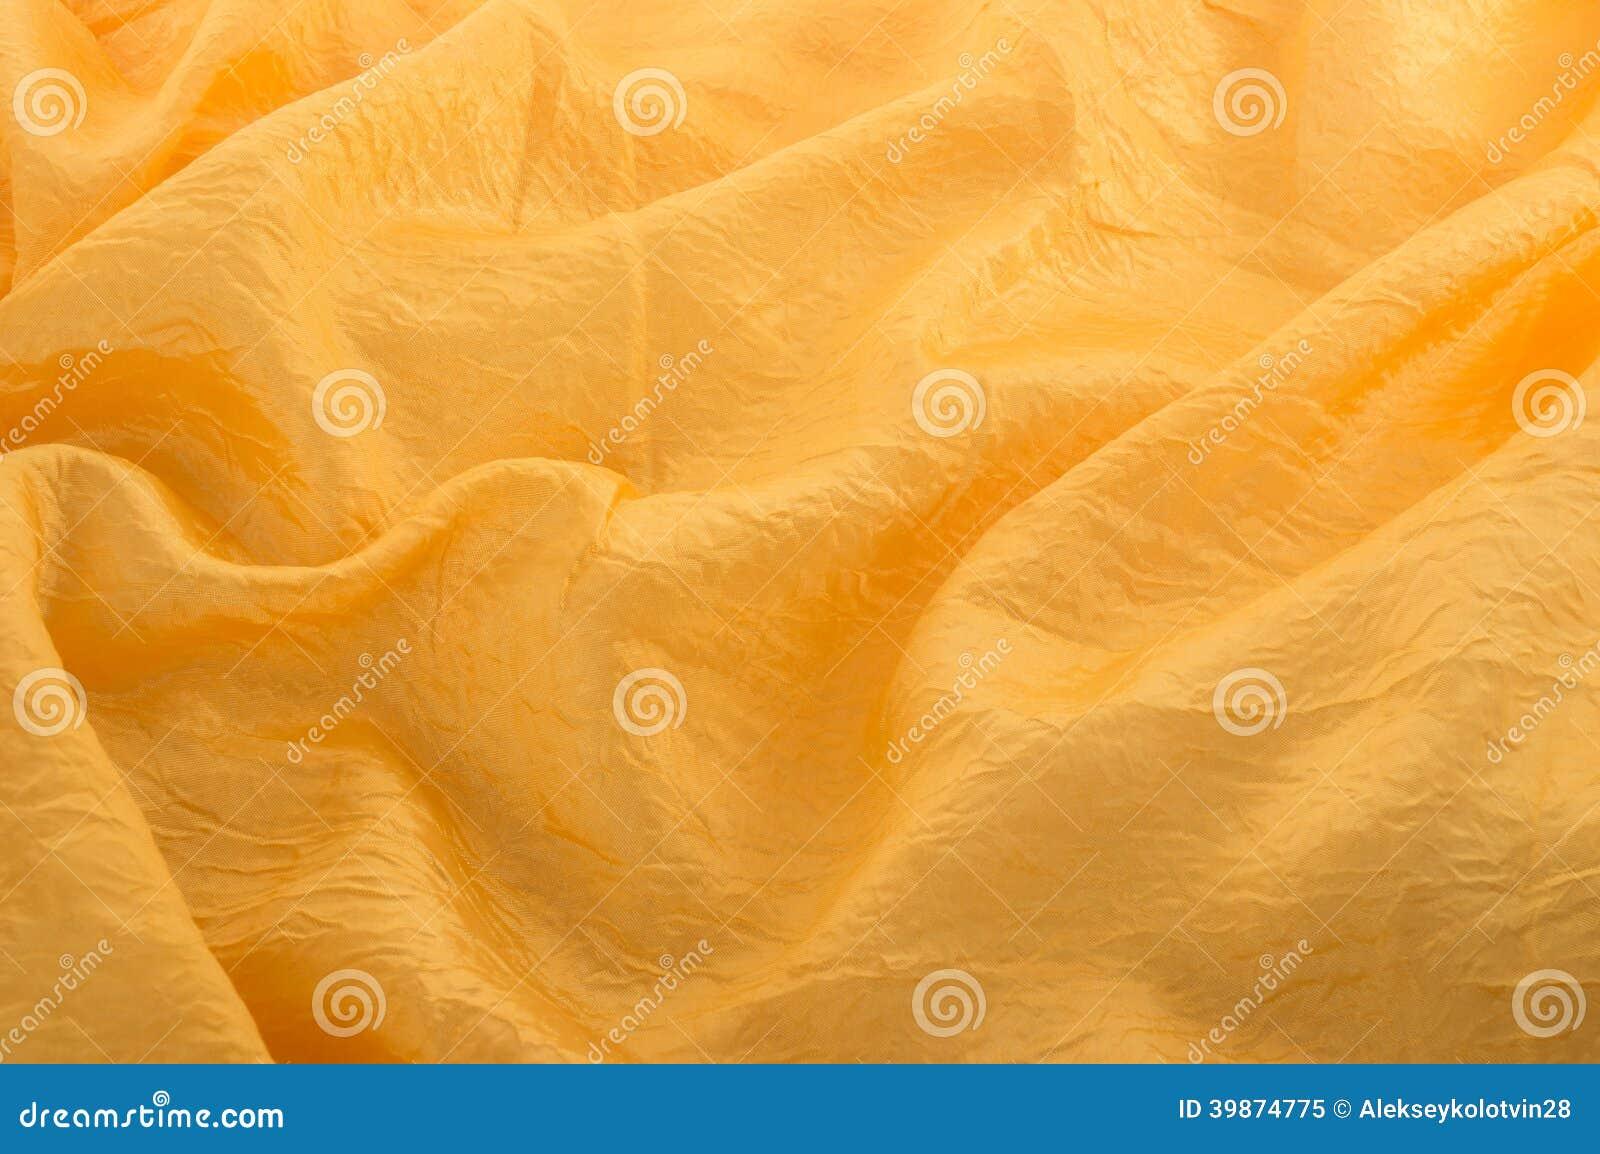 gold satin background - photo #28